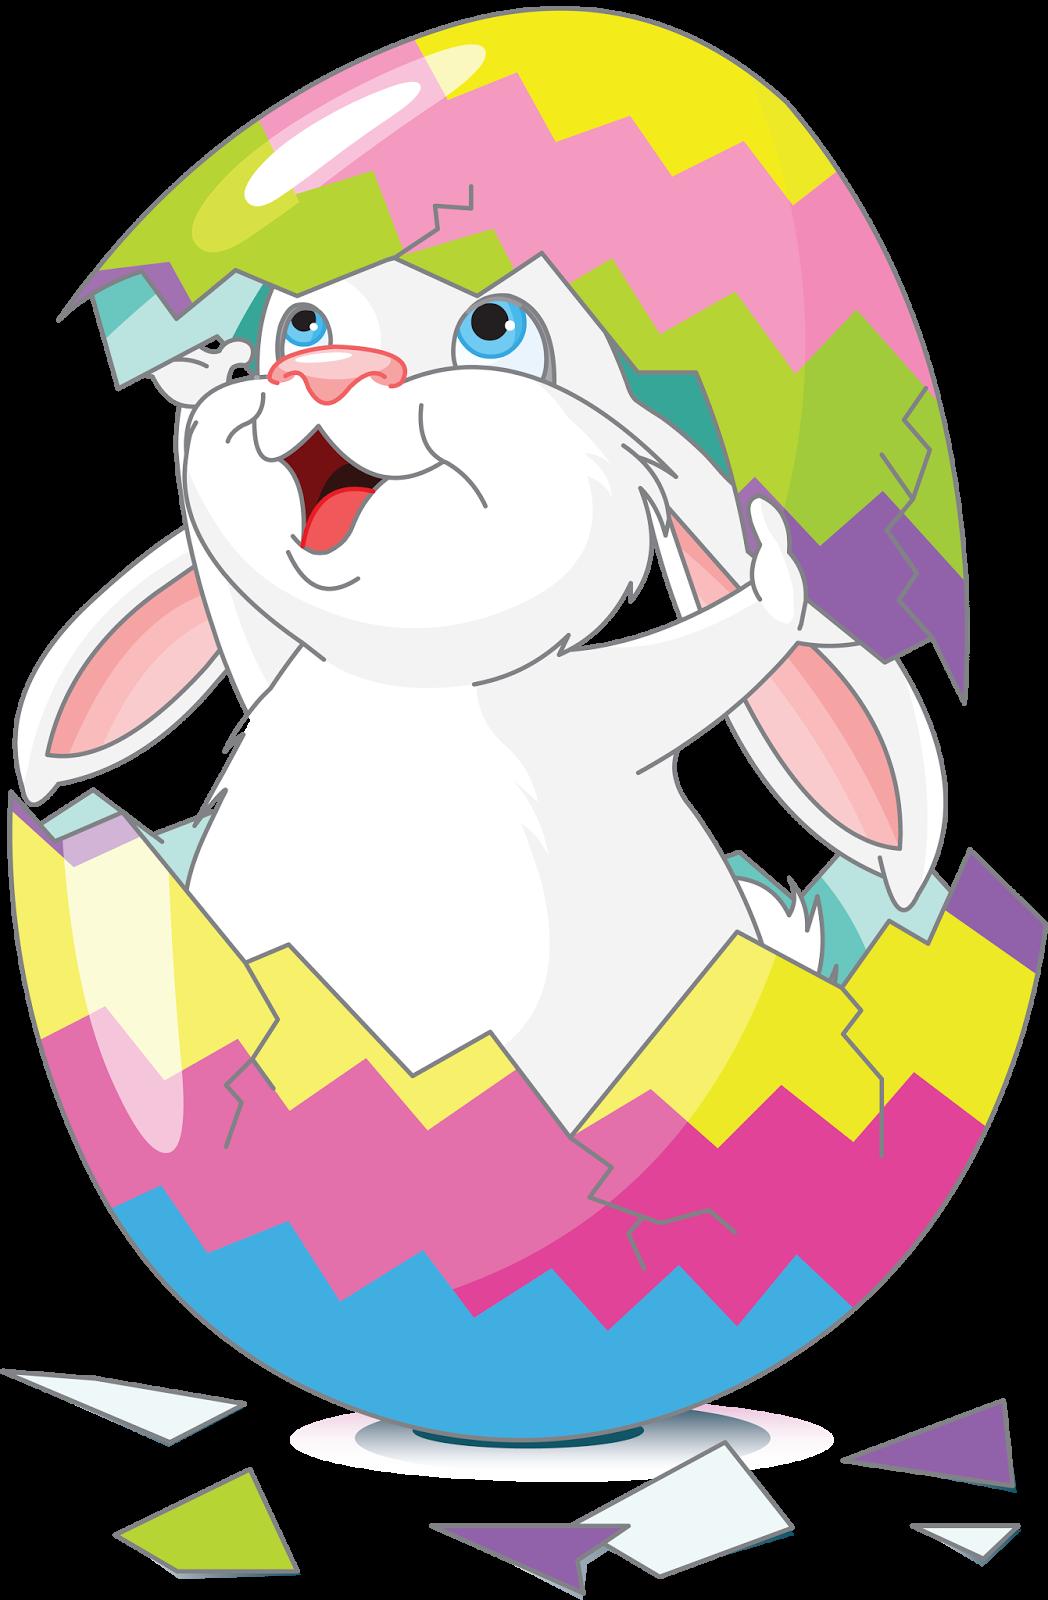 Marcos Gratis Para Fotos Easter Dia De Pascua Dia De La Coneja Primavera Huevos De Pascu Feliz Pascua Tarjetas Fotos De Pascua Imagenes De Felices Pascuas